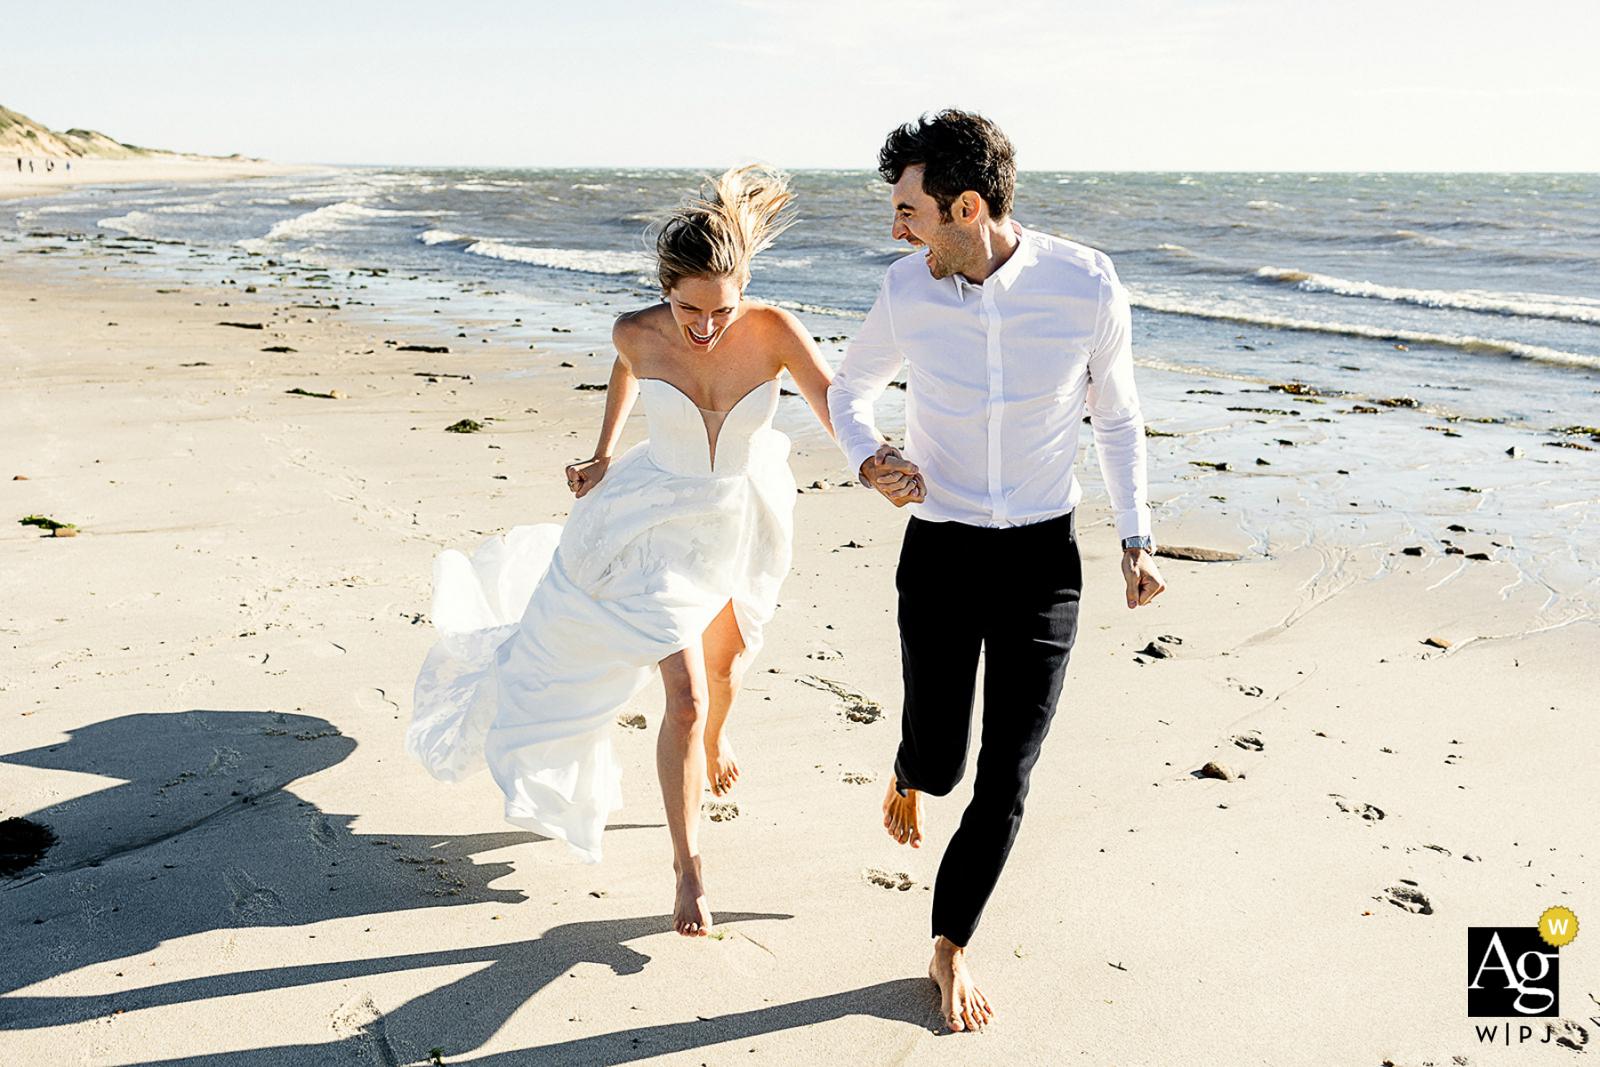 Wellfleet, MA creative beach sand running wedding image of the Bride and groom in the sunshine